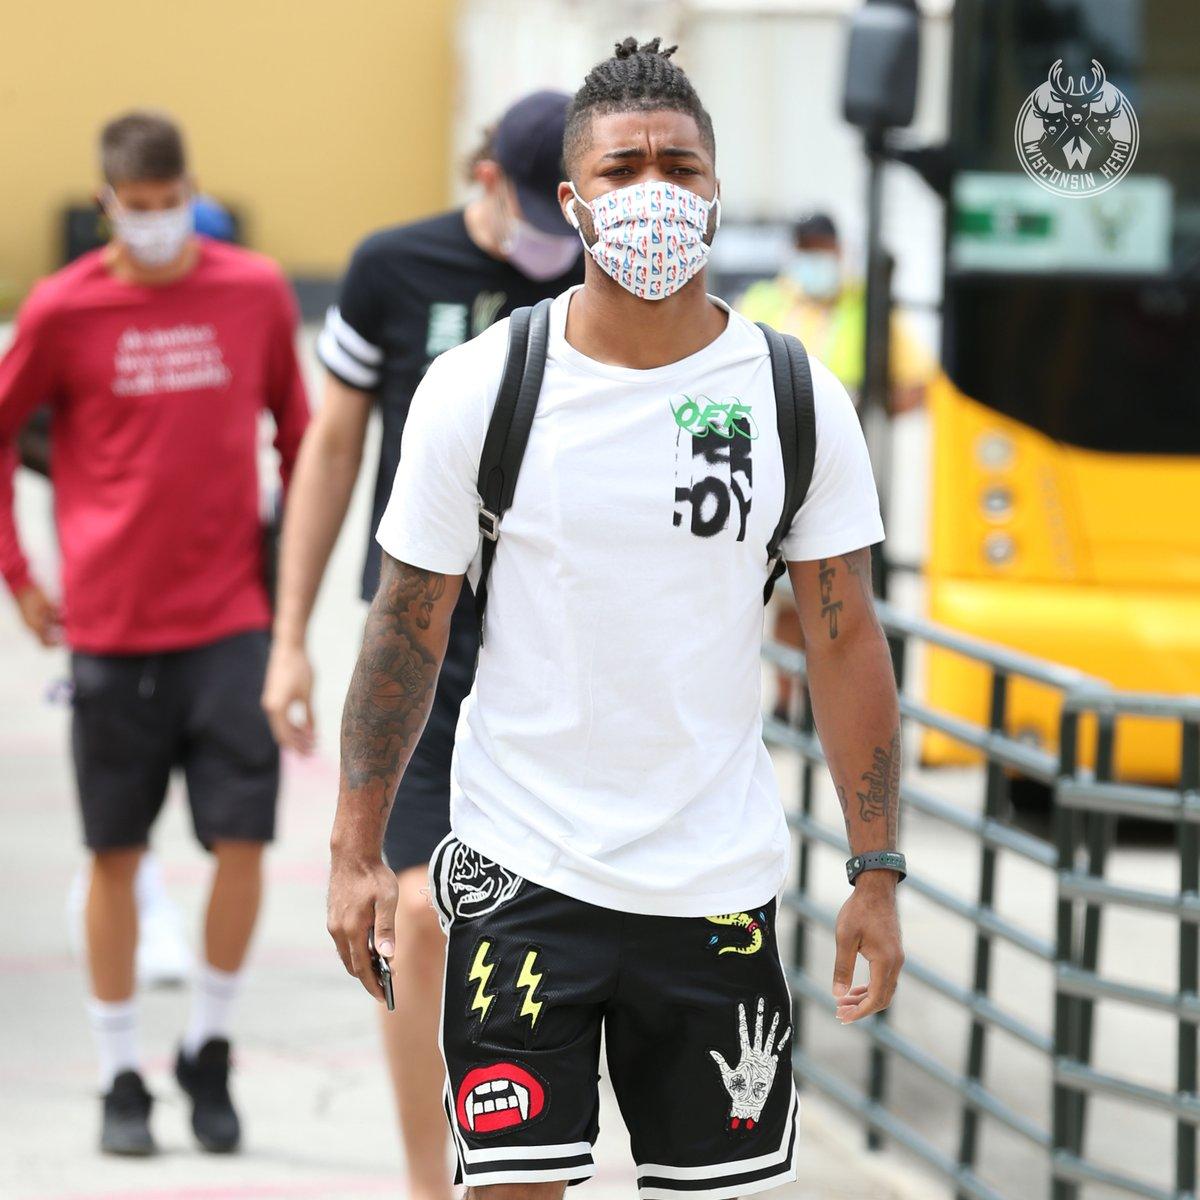 Look at our @nbagleague MVP @FrankMason0 wearing his mask man. So inspirational.  #MaskUpWI | #NBATogether https://t.co/bbszQTGBKB